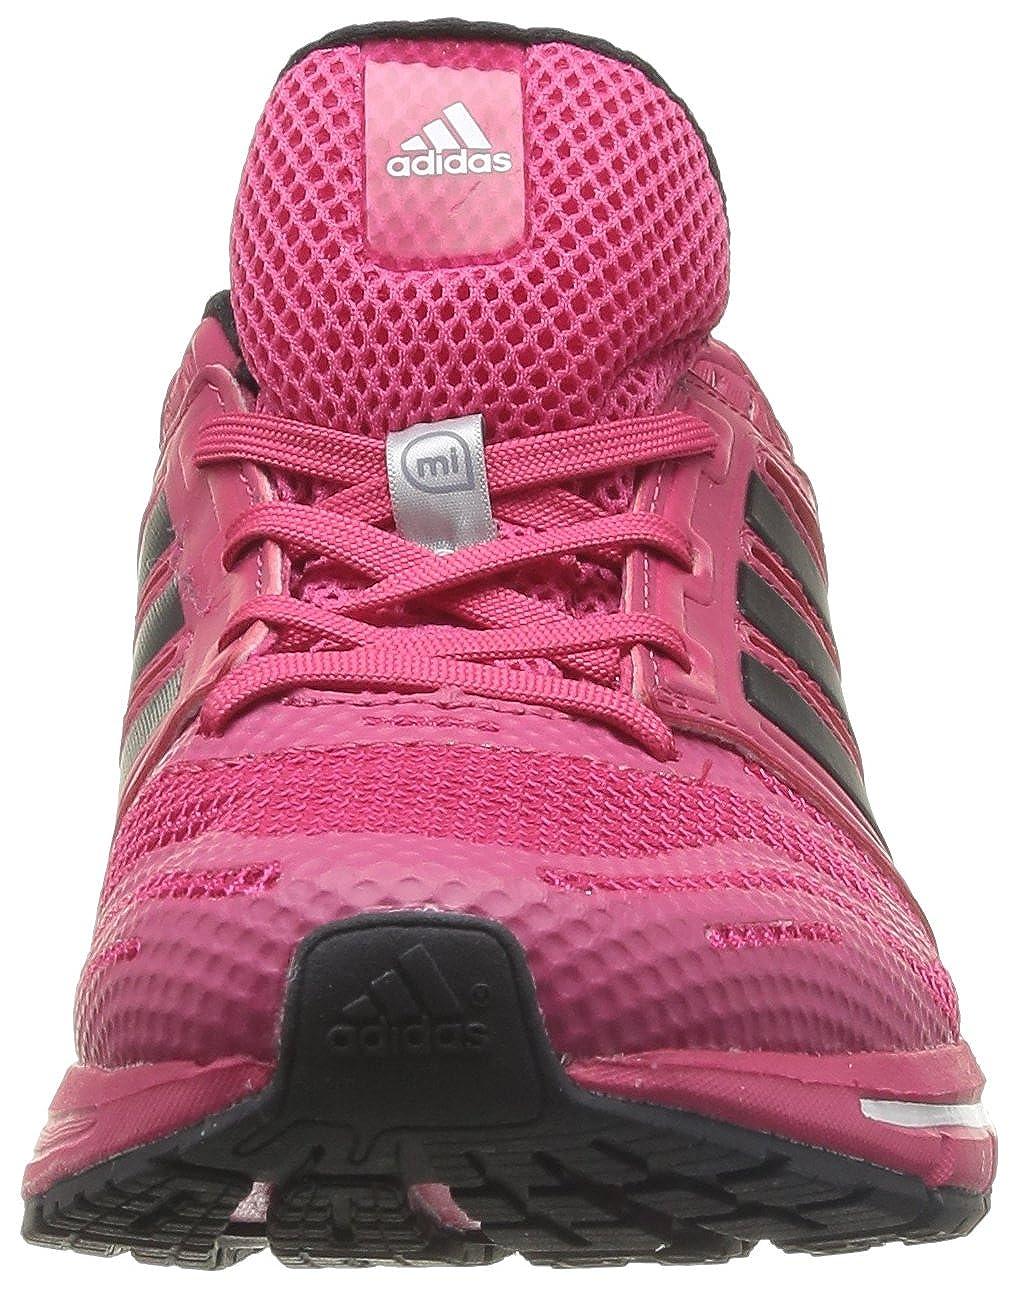 adidas revenergy boost rose